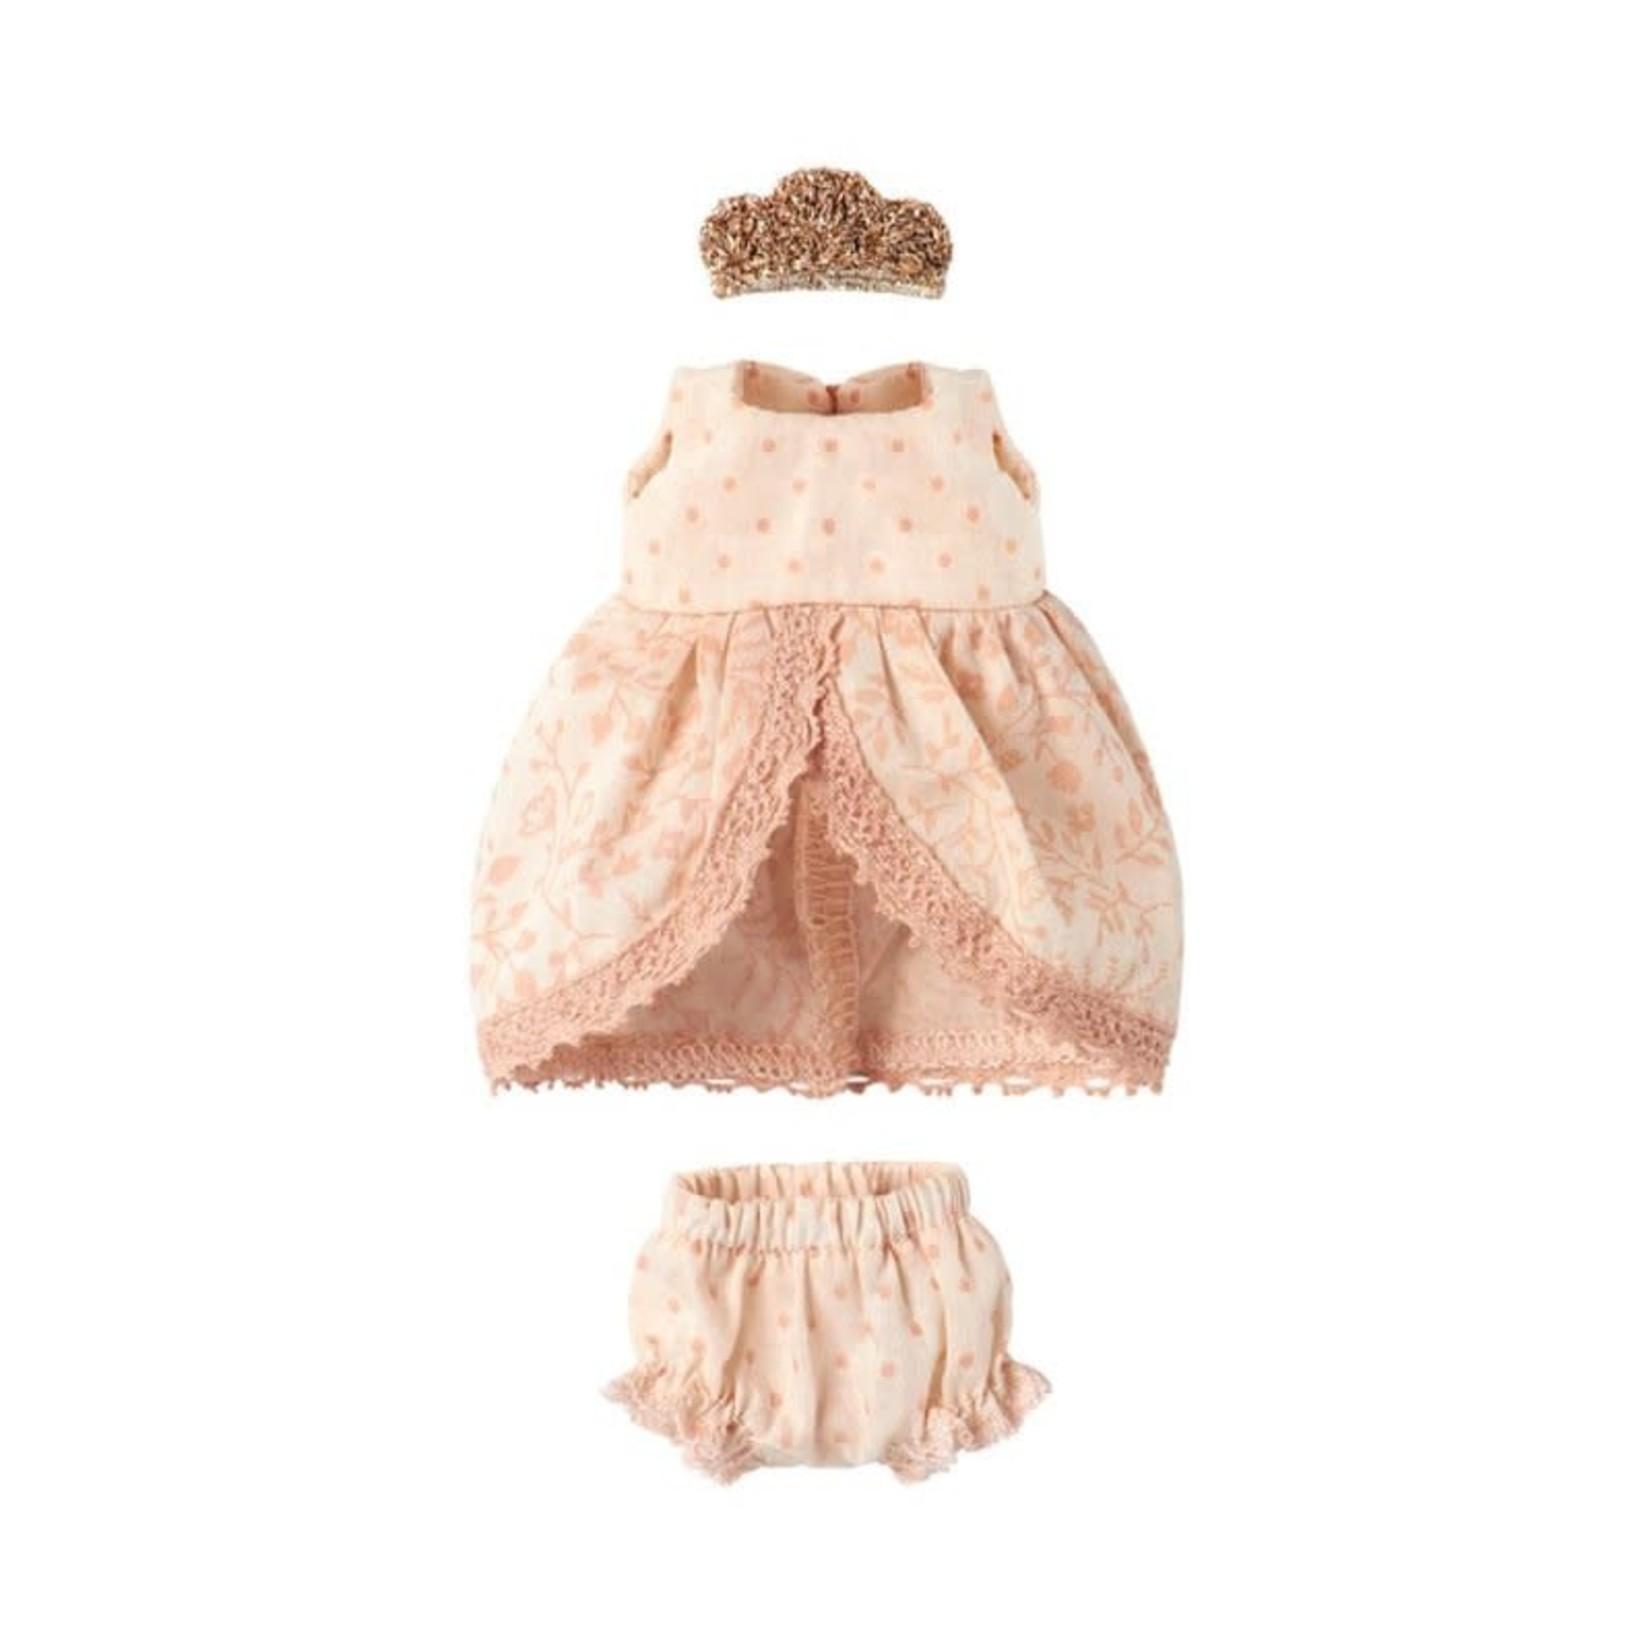 Maileg Micro & Mouse, Princess Dress - Maileg